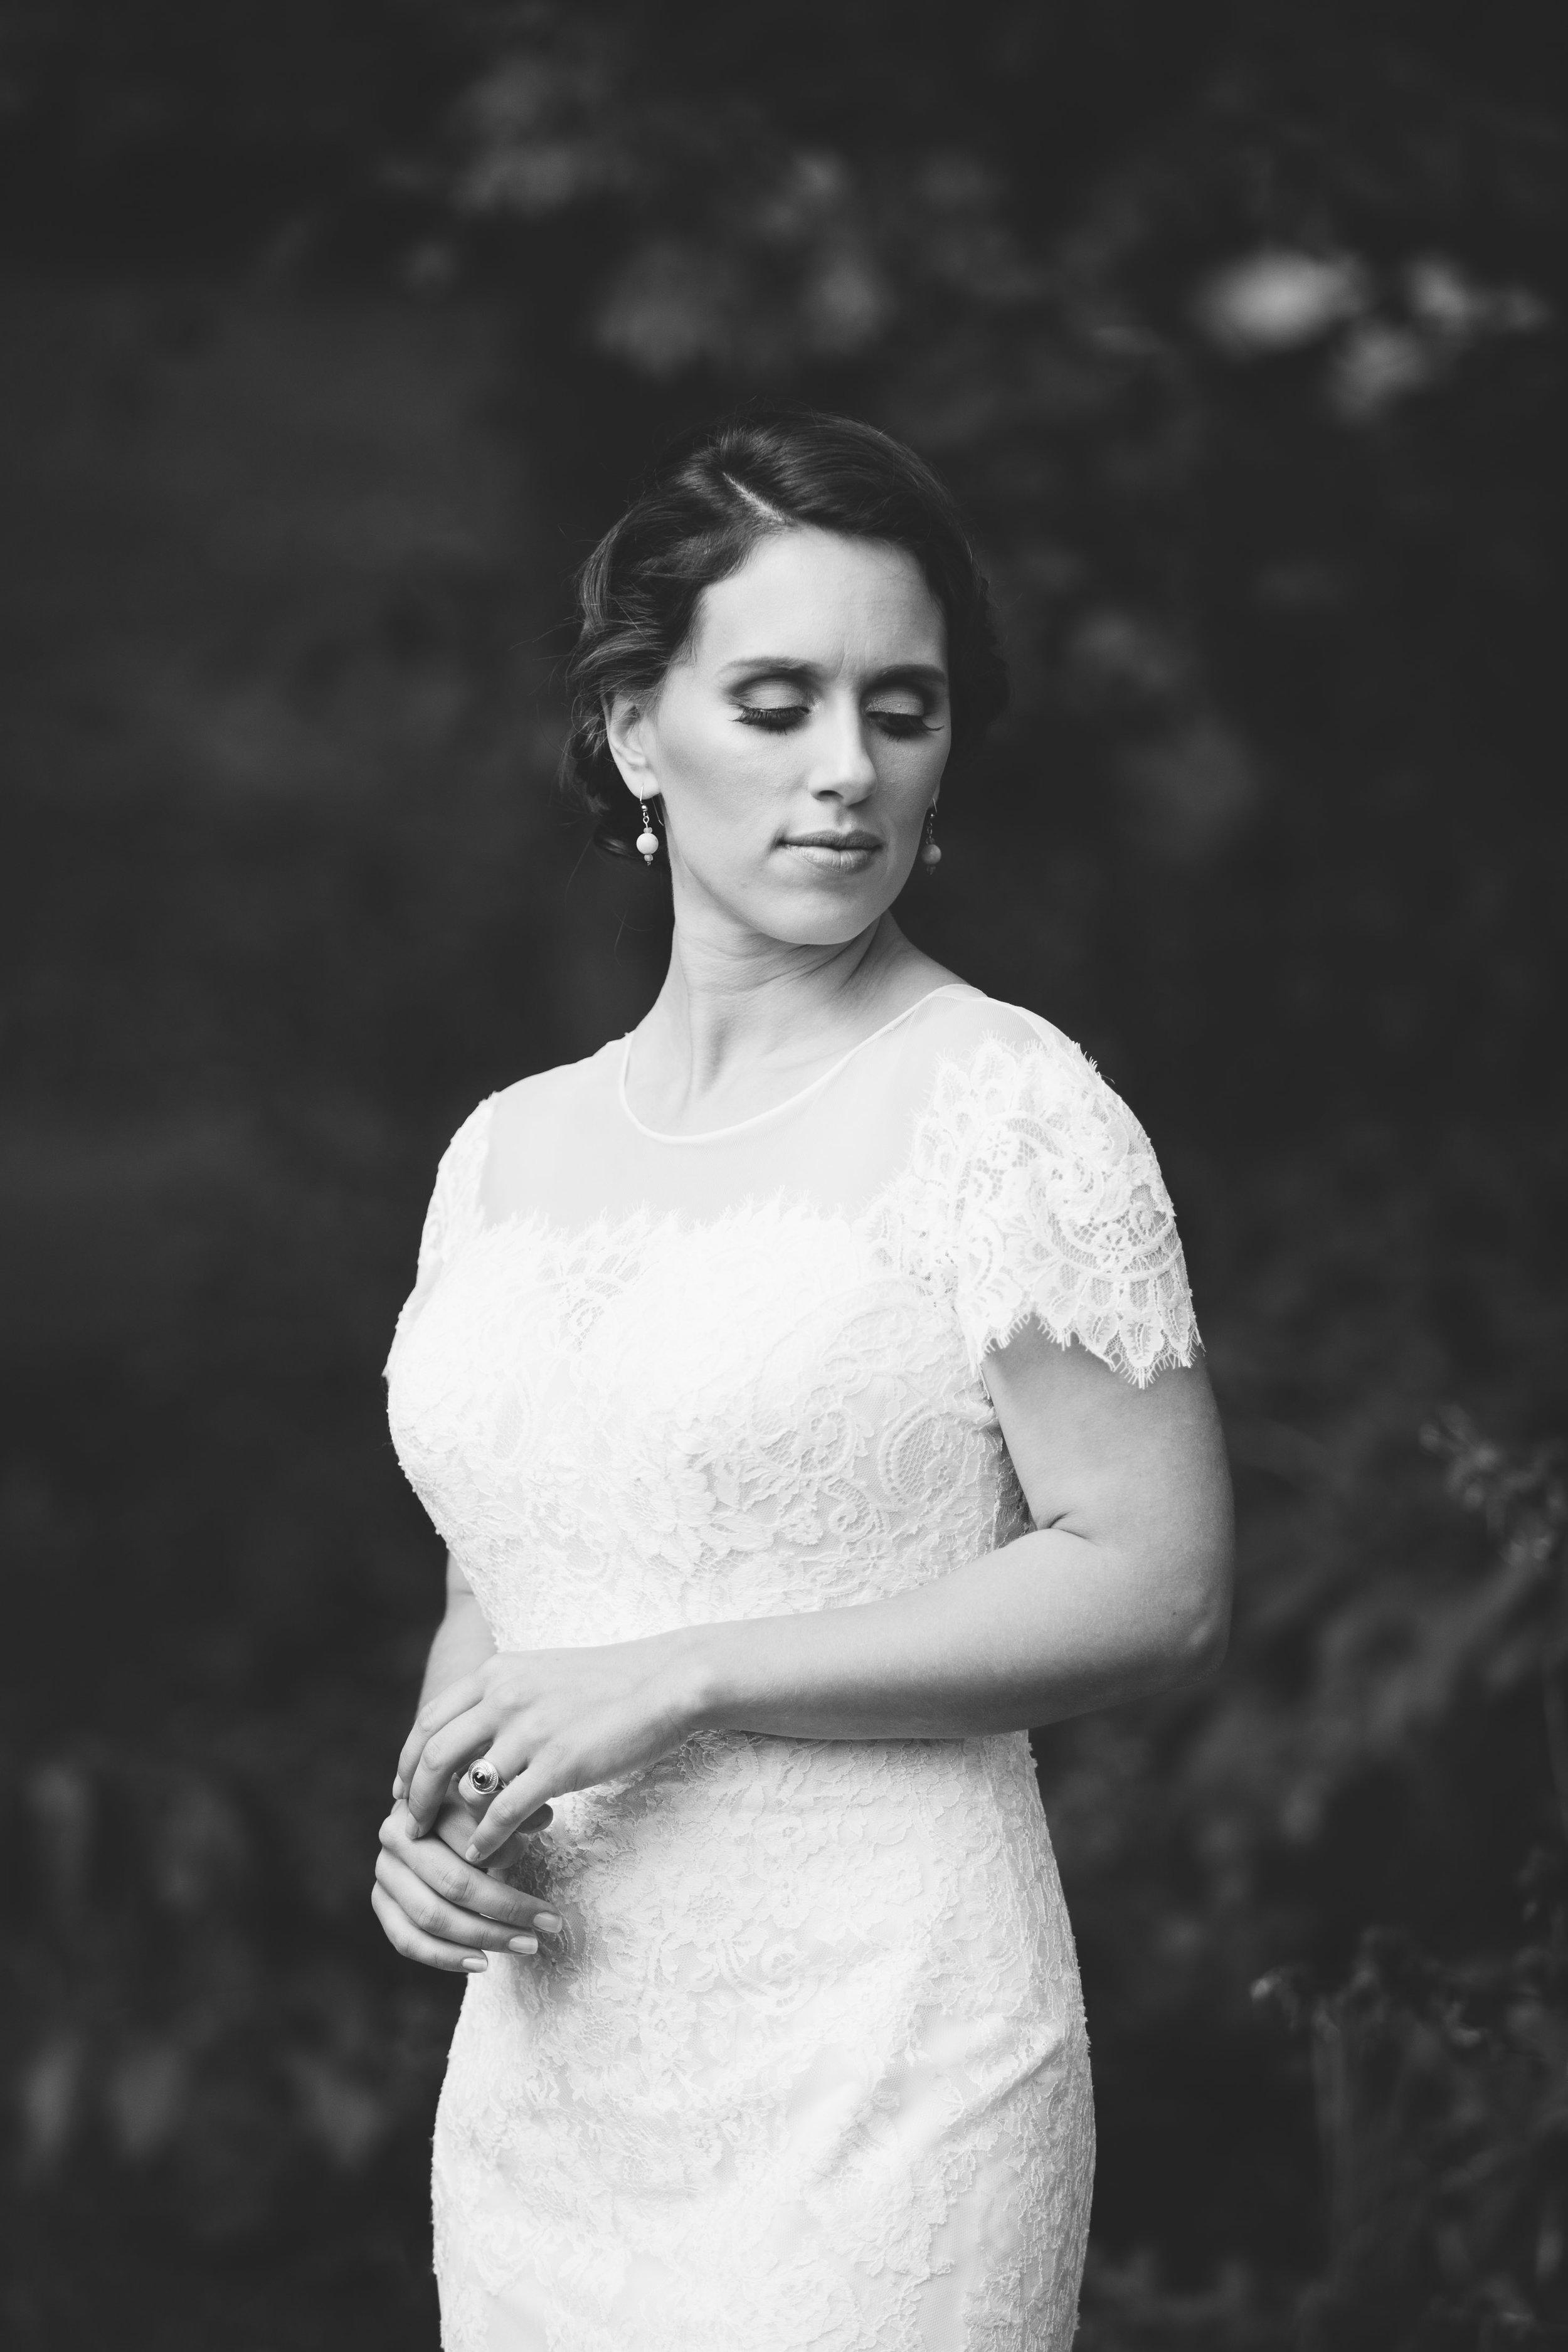 grand_rapids_wedding_rockford_wedding_richard_app_gallery_wedding_grand_rapids_wedding_photographer_summer_wedding_wabasis_lake_park_wedding_rustic_wedding-16.jpg